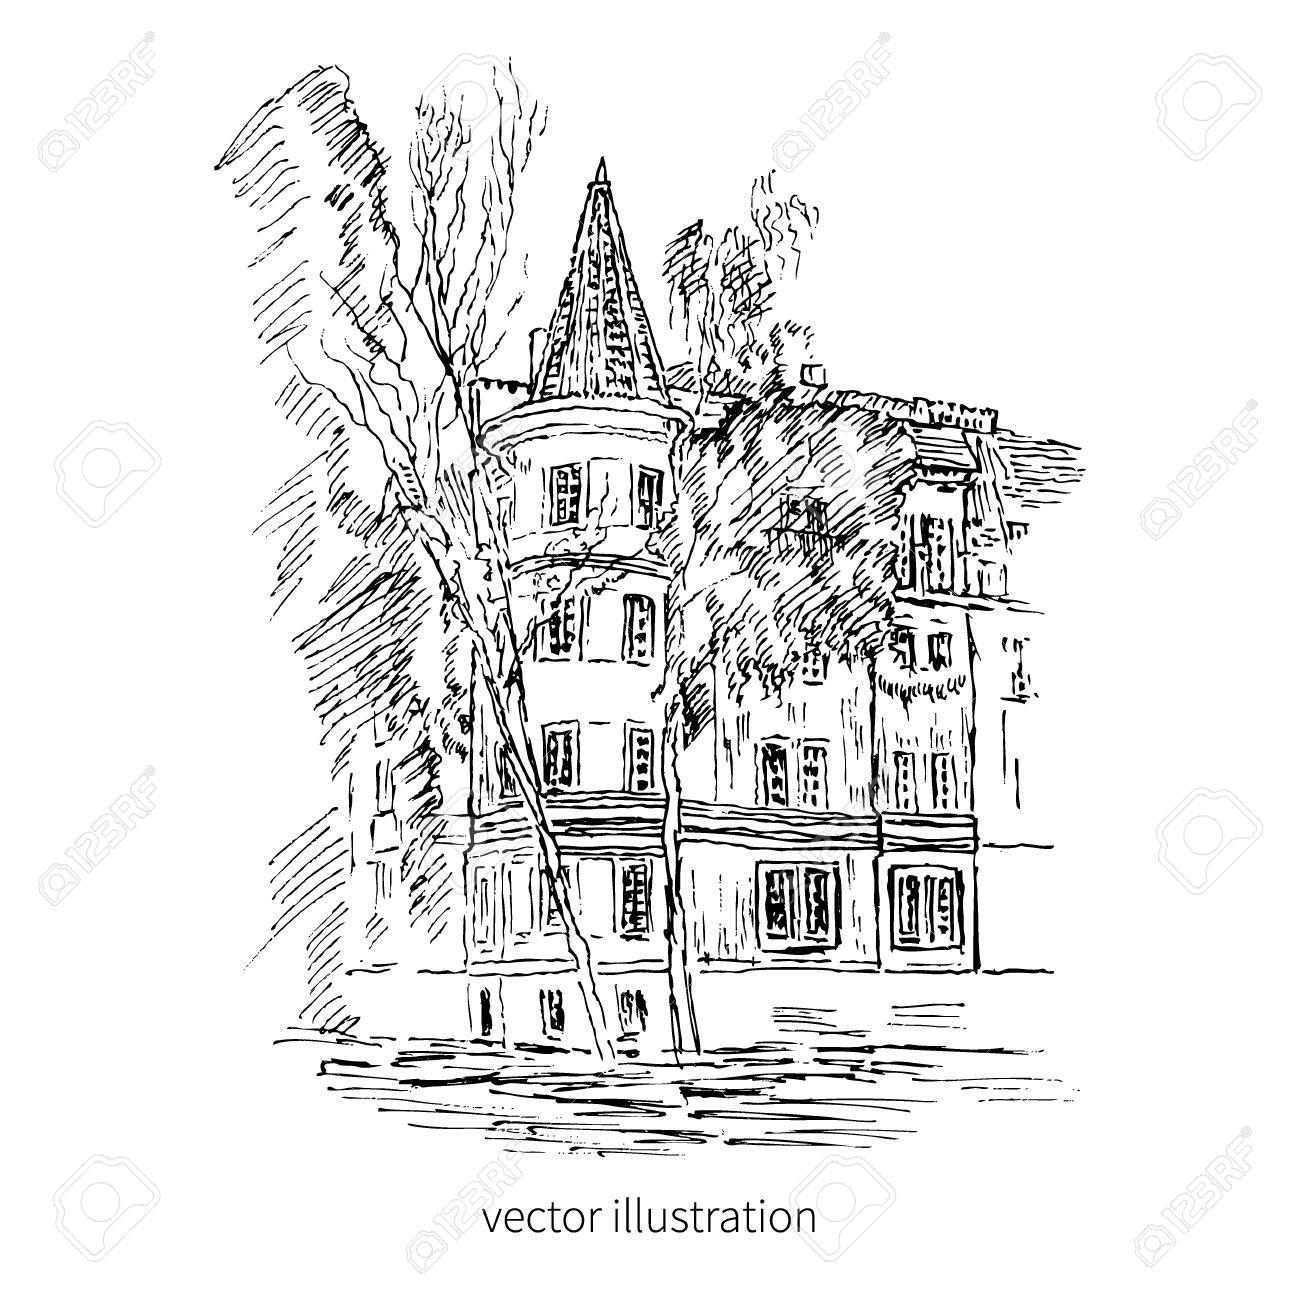 1300x1300 Vintage Tile Old European House, Vector Graphic Illustration